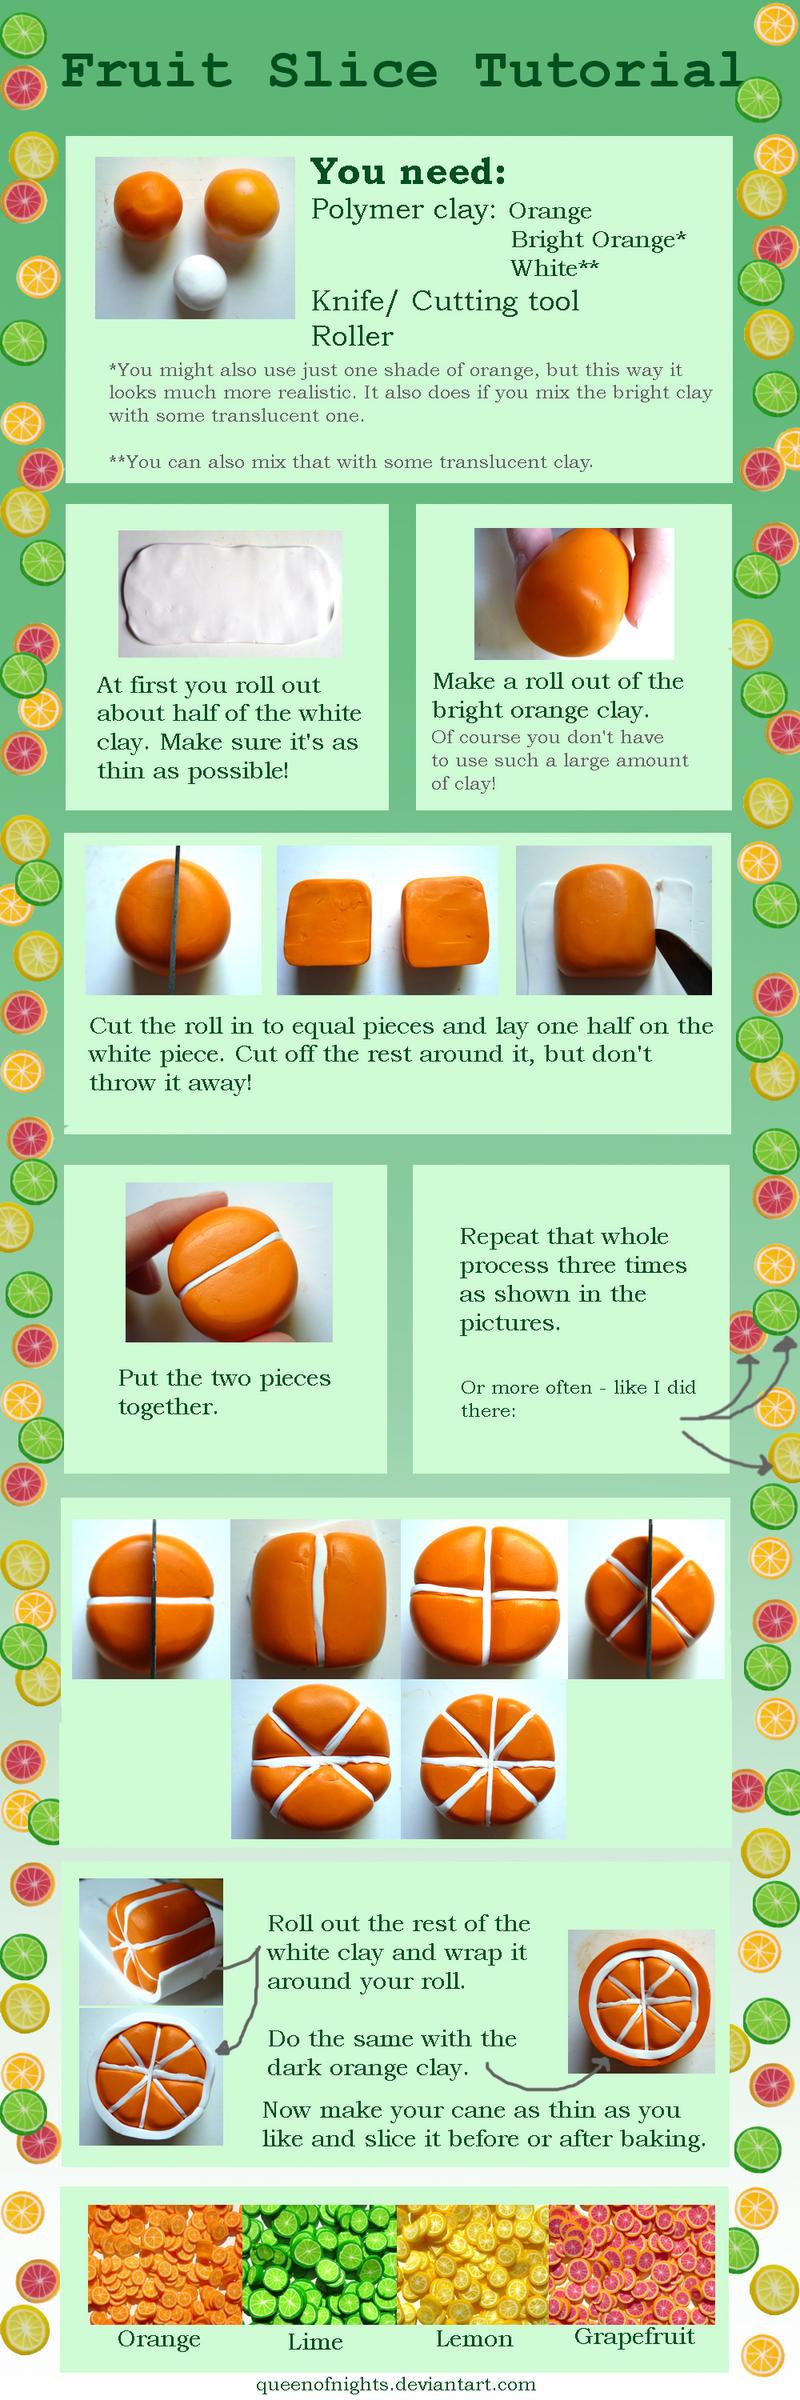 Fruit Slice Tutorial by QueEnOfNights